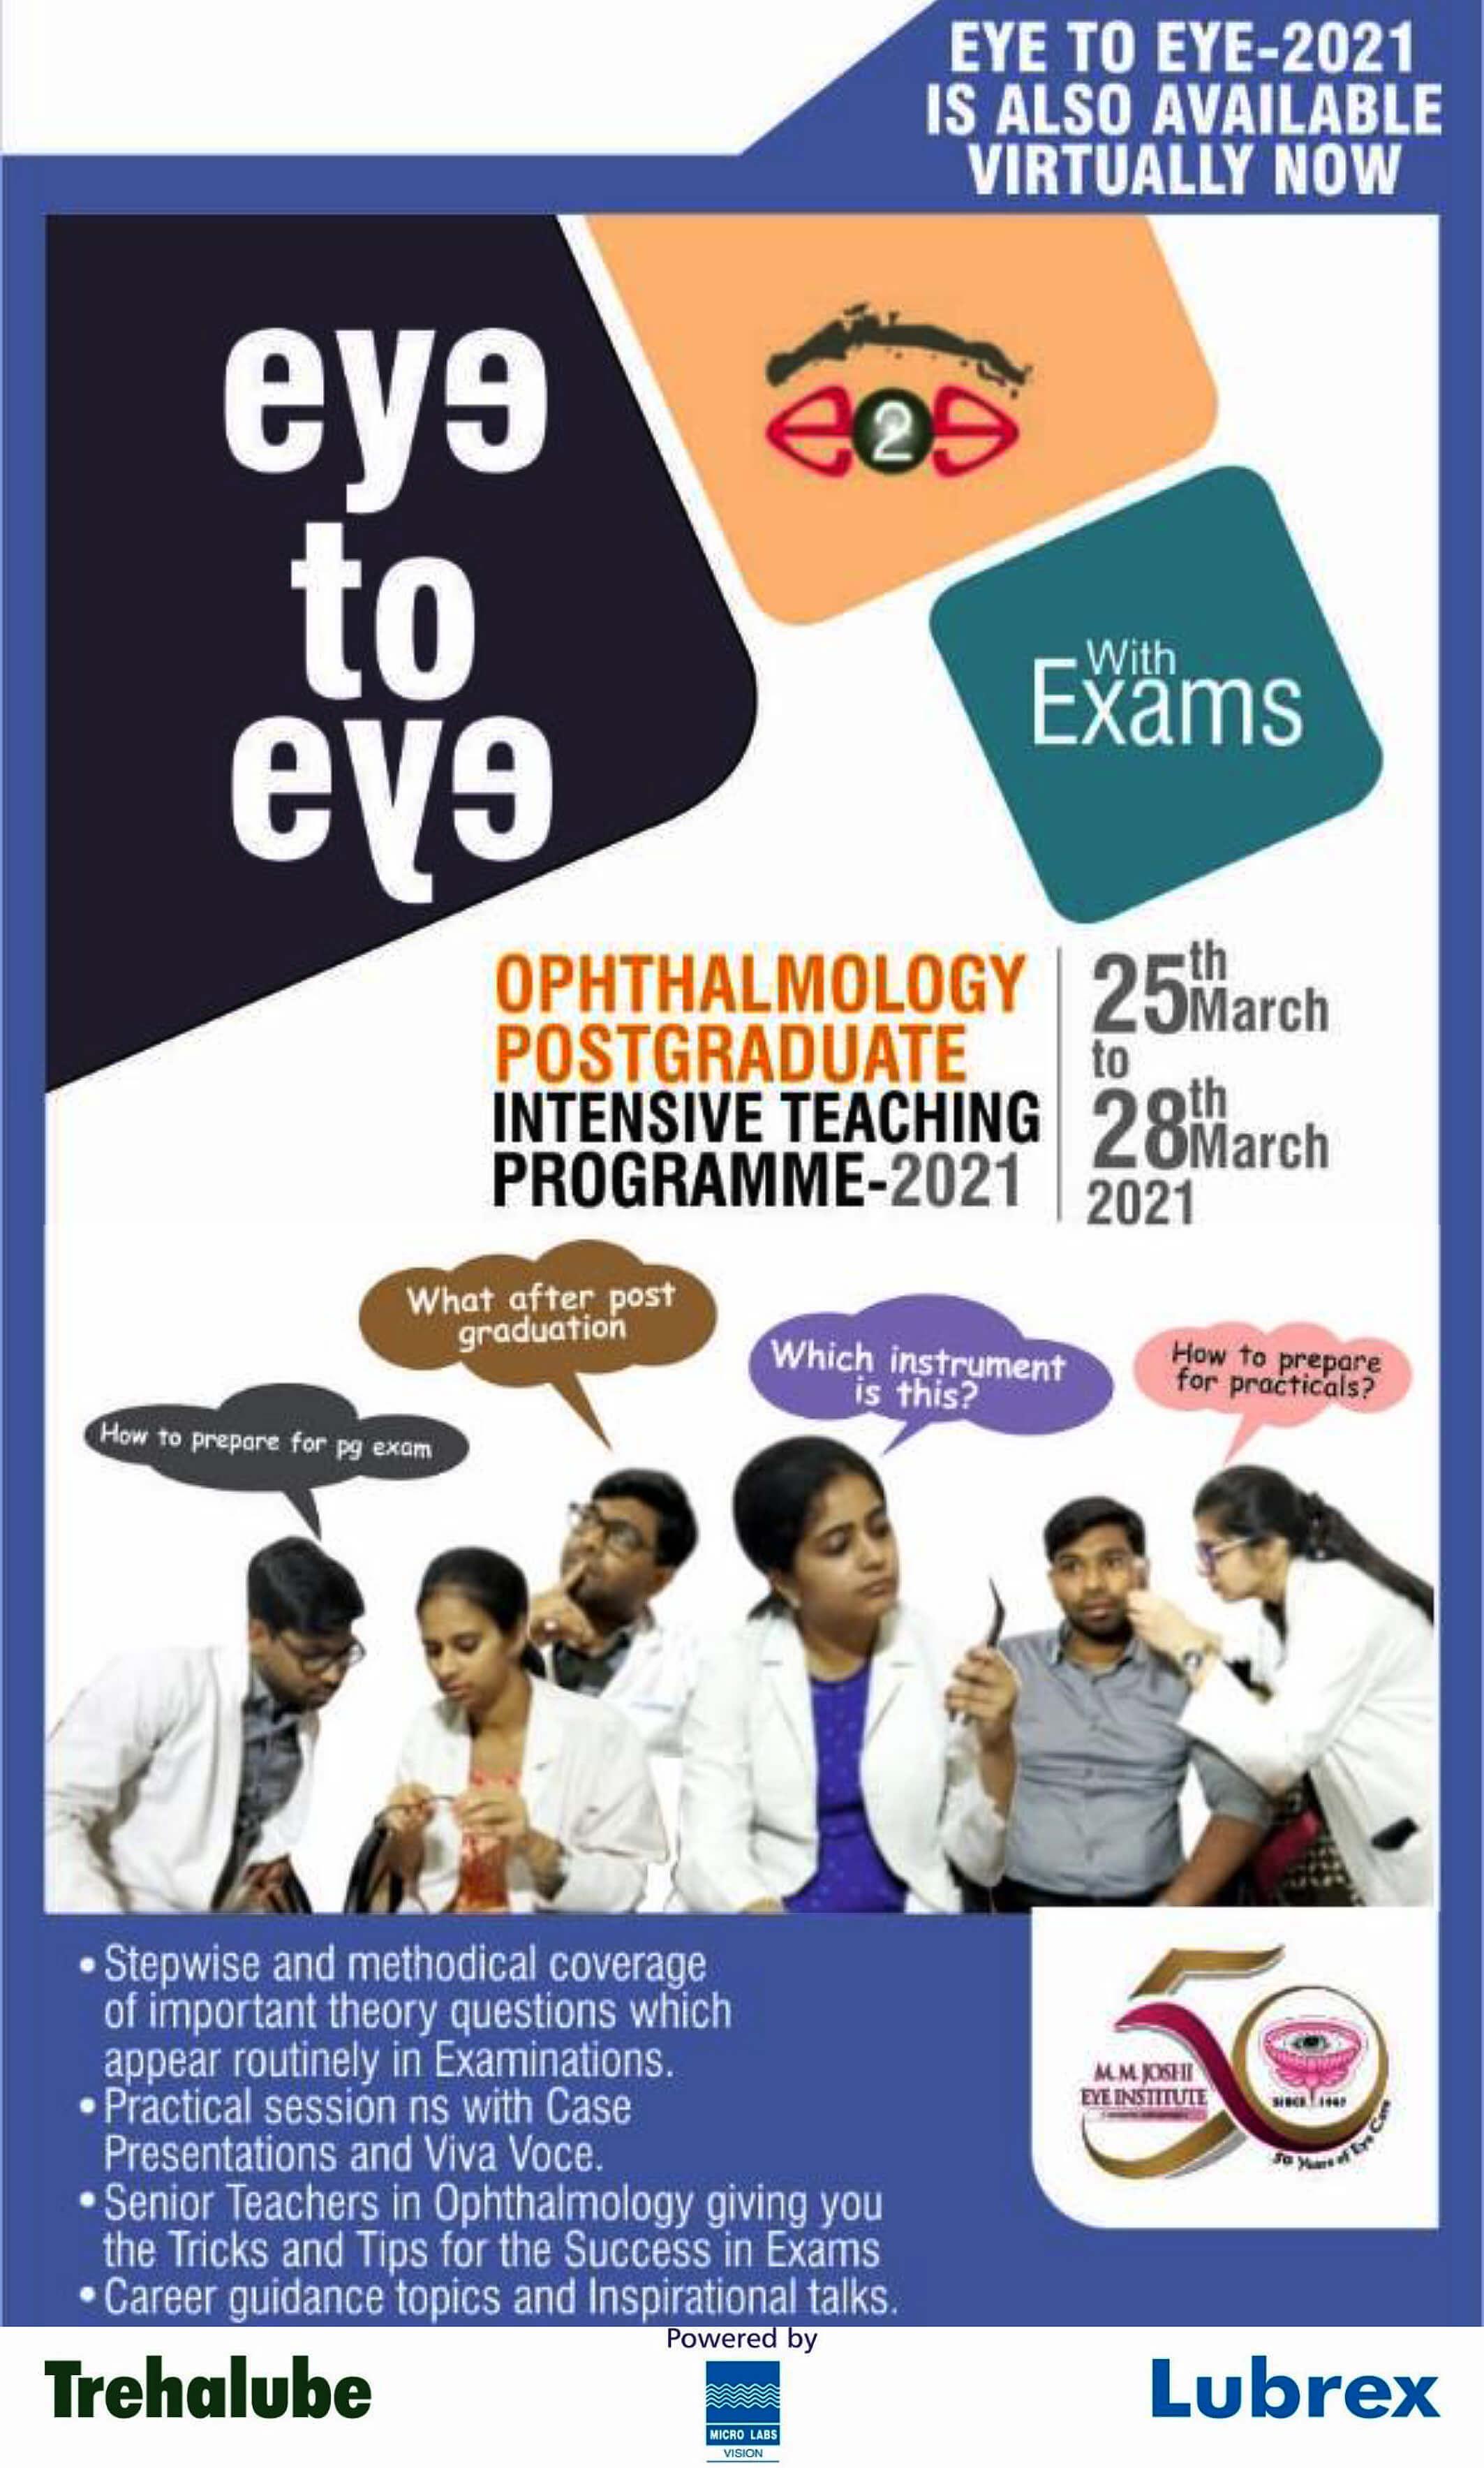 Eye to Eye 2021 - Register Now